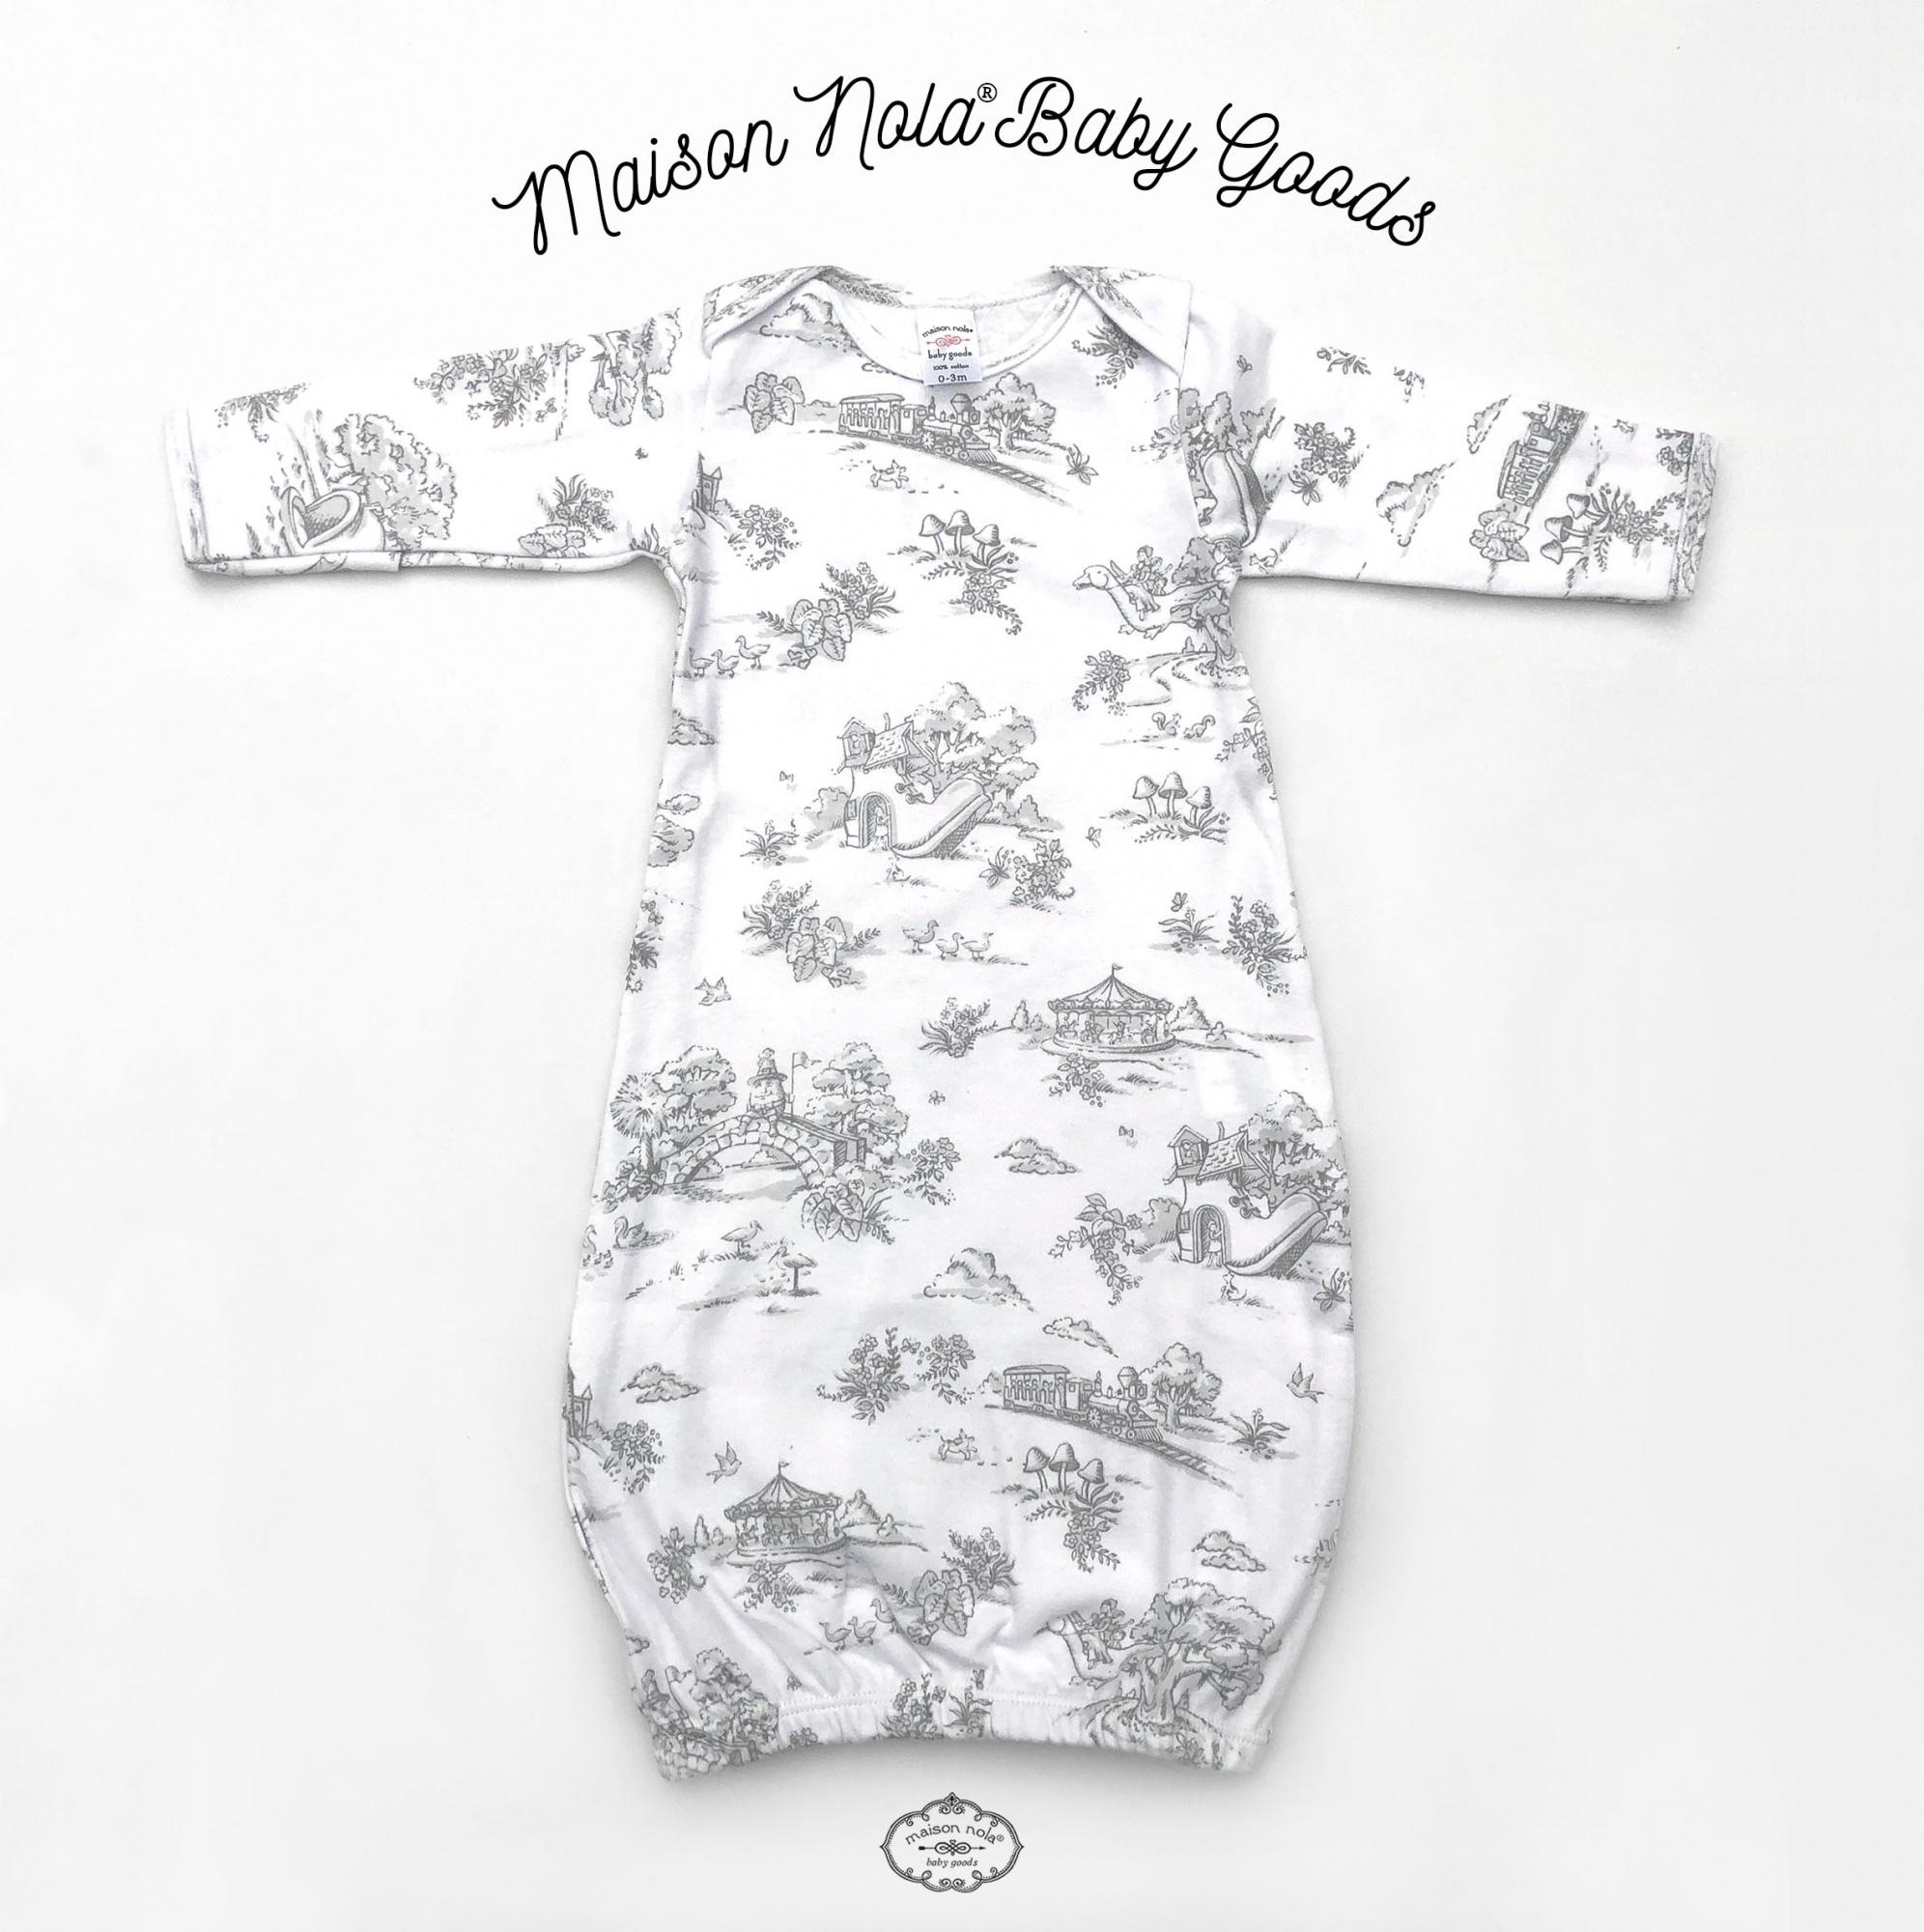 Maison Nola Maison Nola Storyland Toile Gown Grey